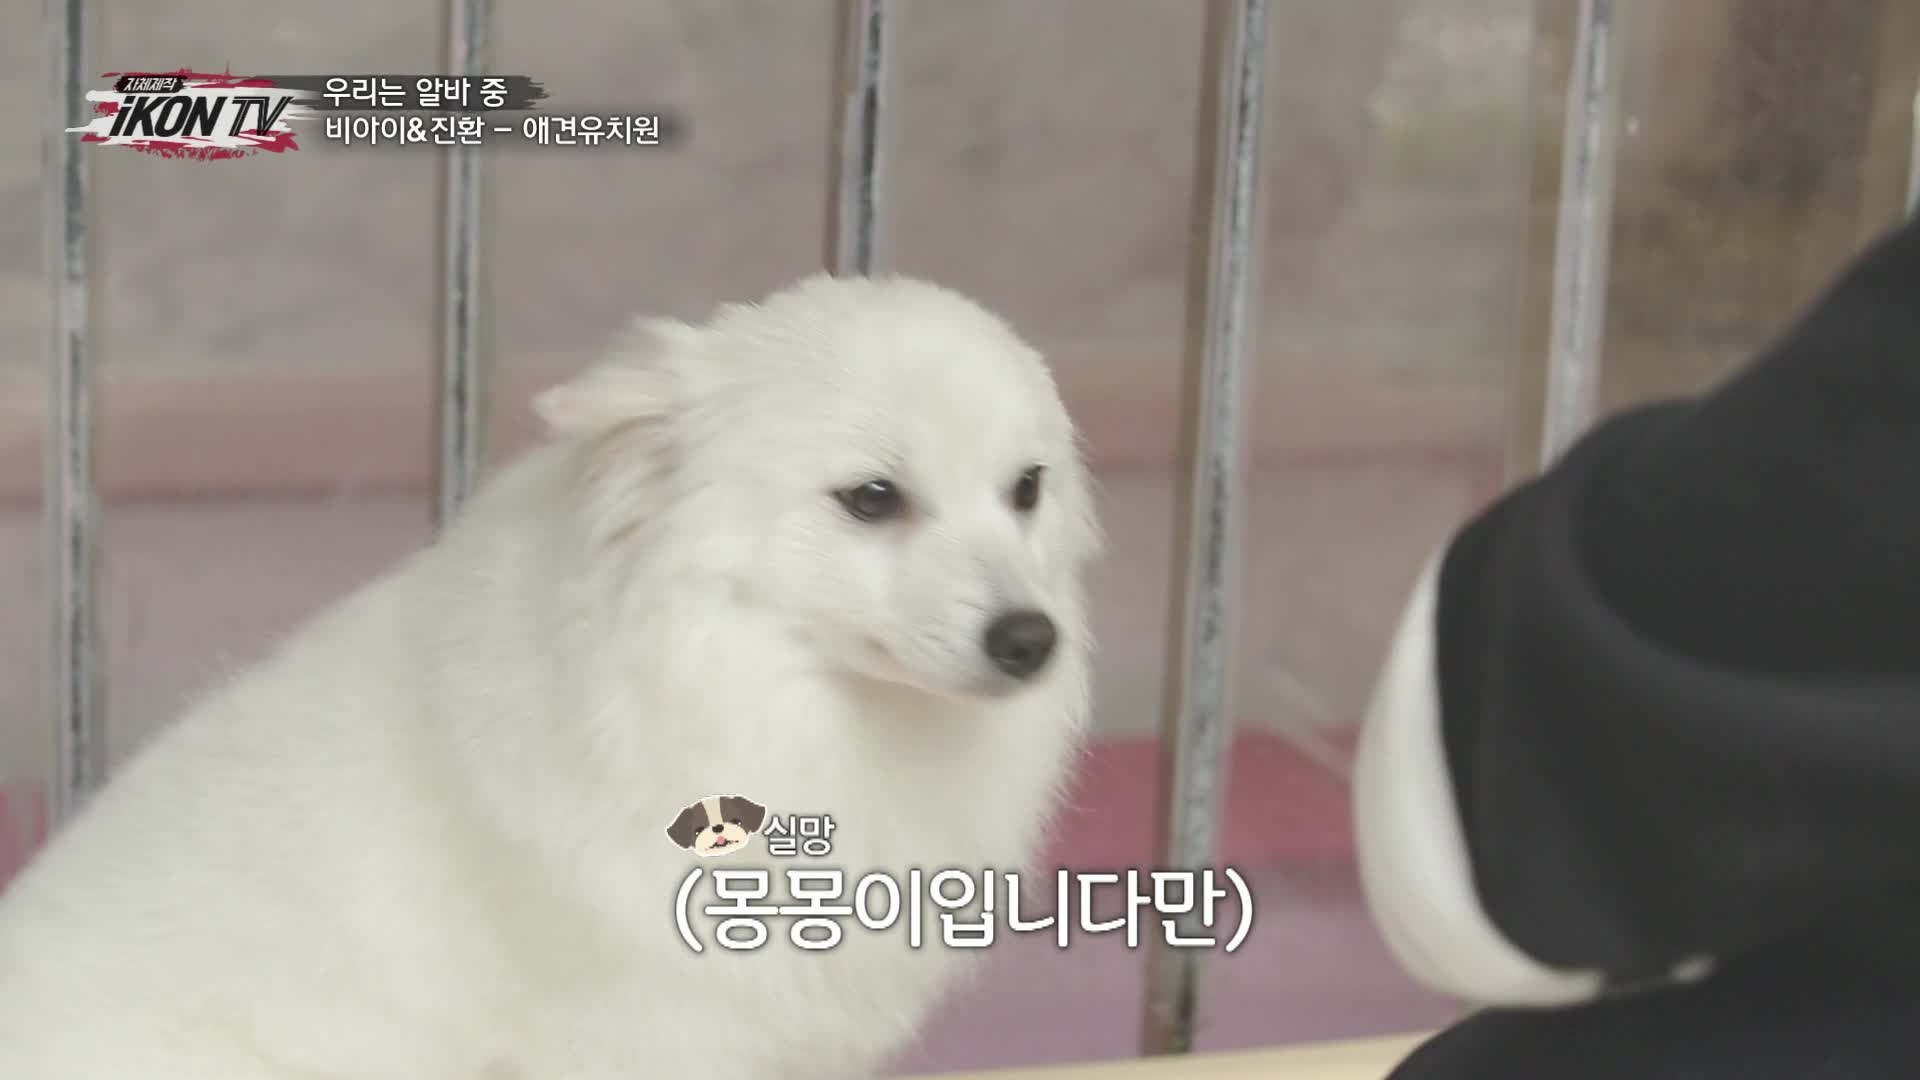 iKON - '자체제작 iKON TV' EP.3-4